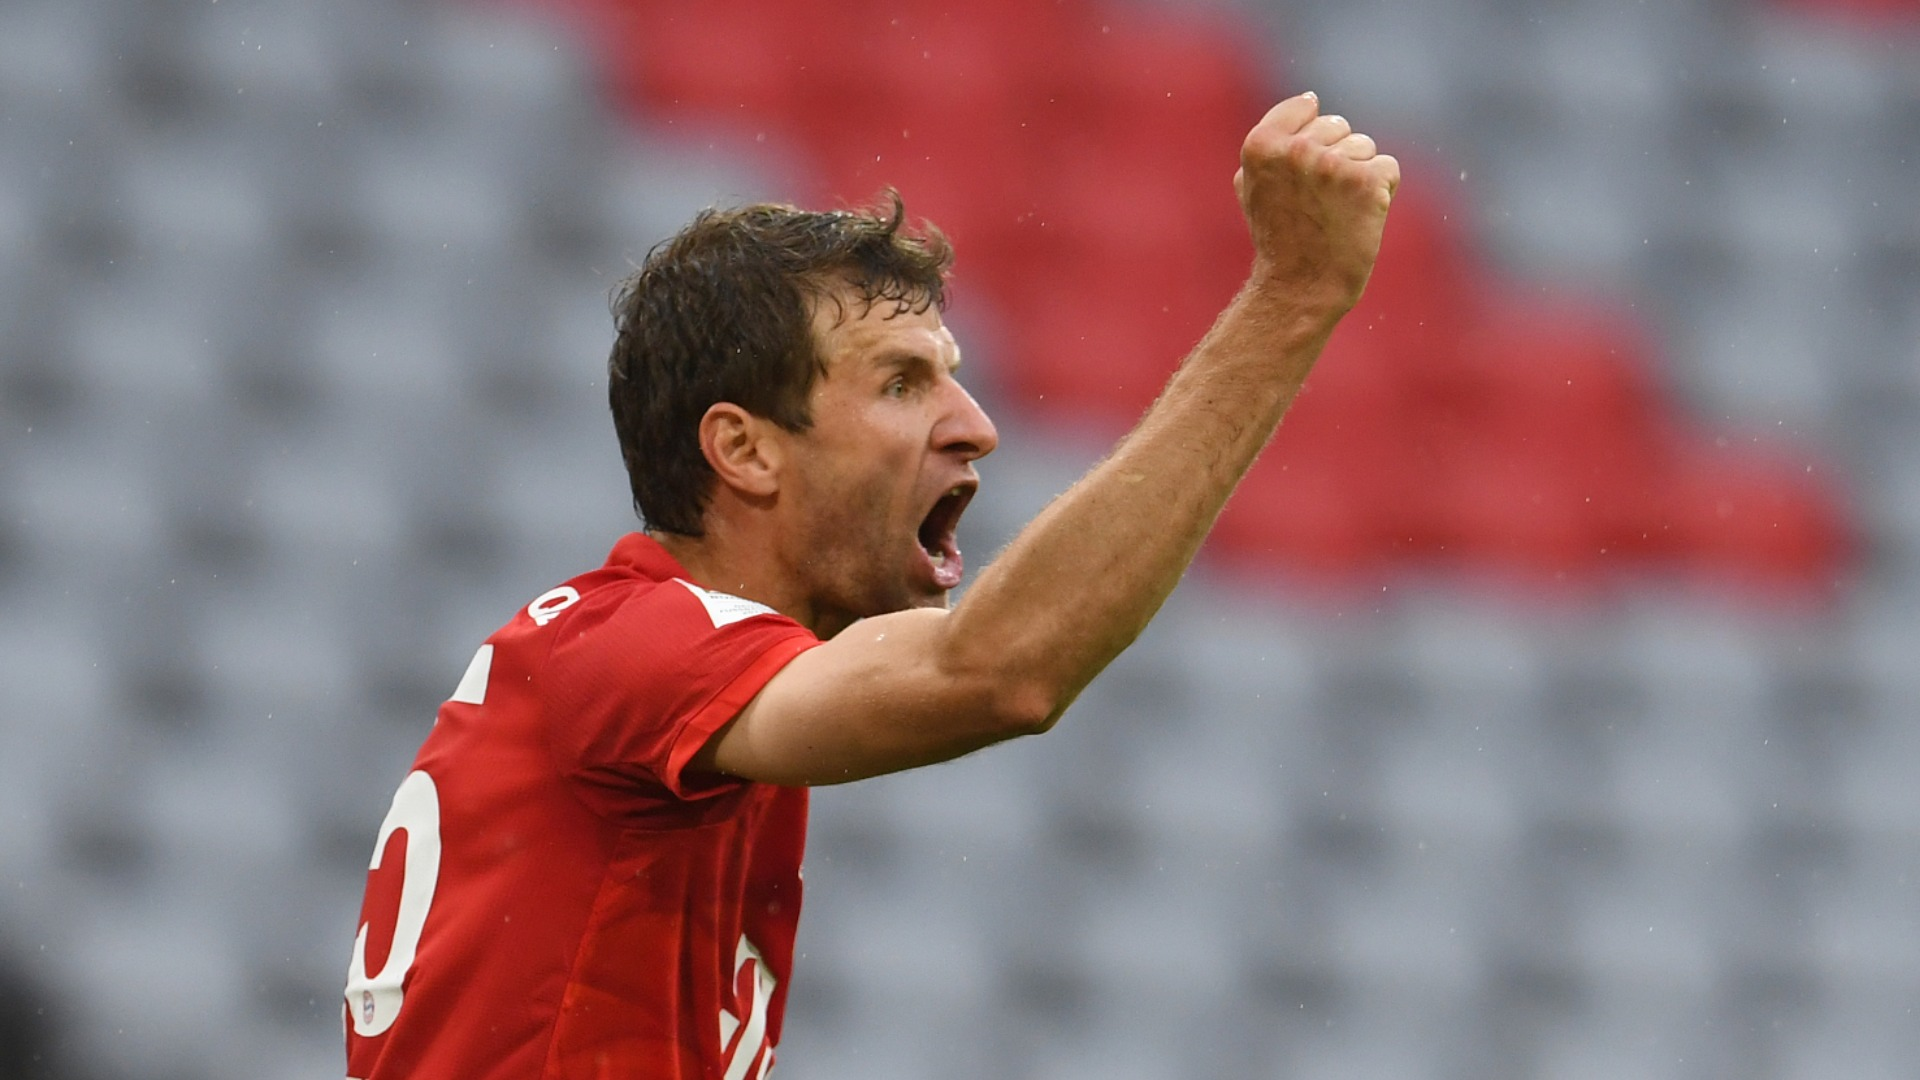 Bayern Munich sit four points clear of Borussia Dortmund again after an entertaining 5-2 win over Eintracht Frankfurt.